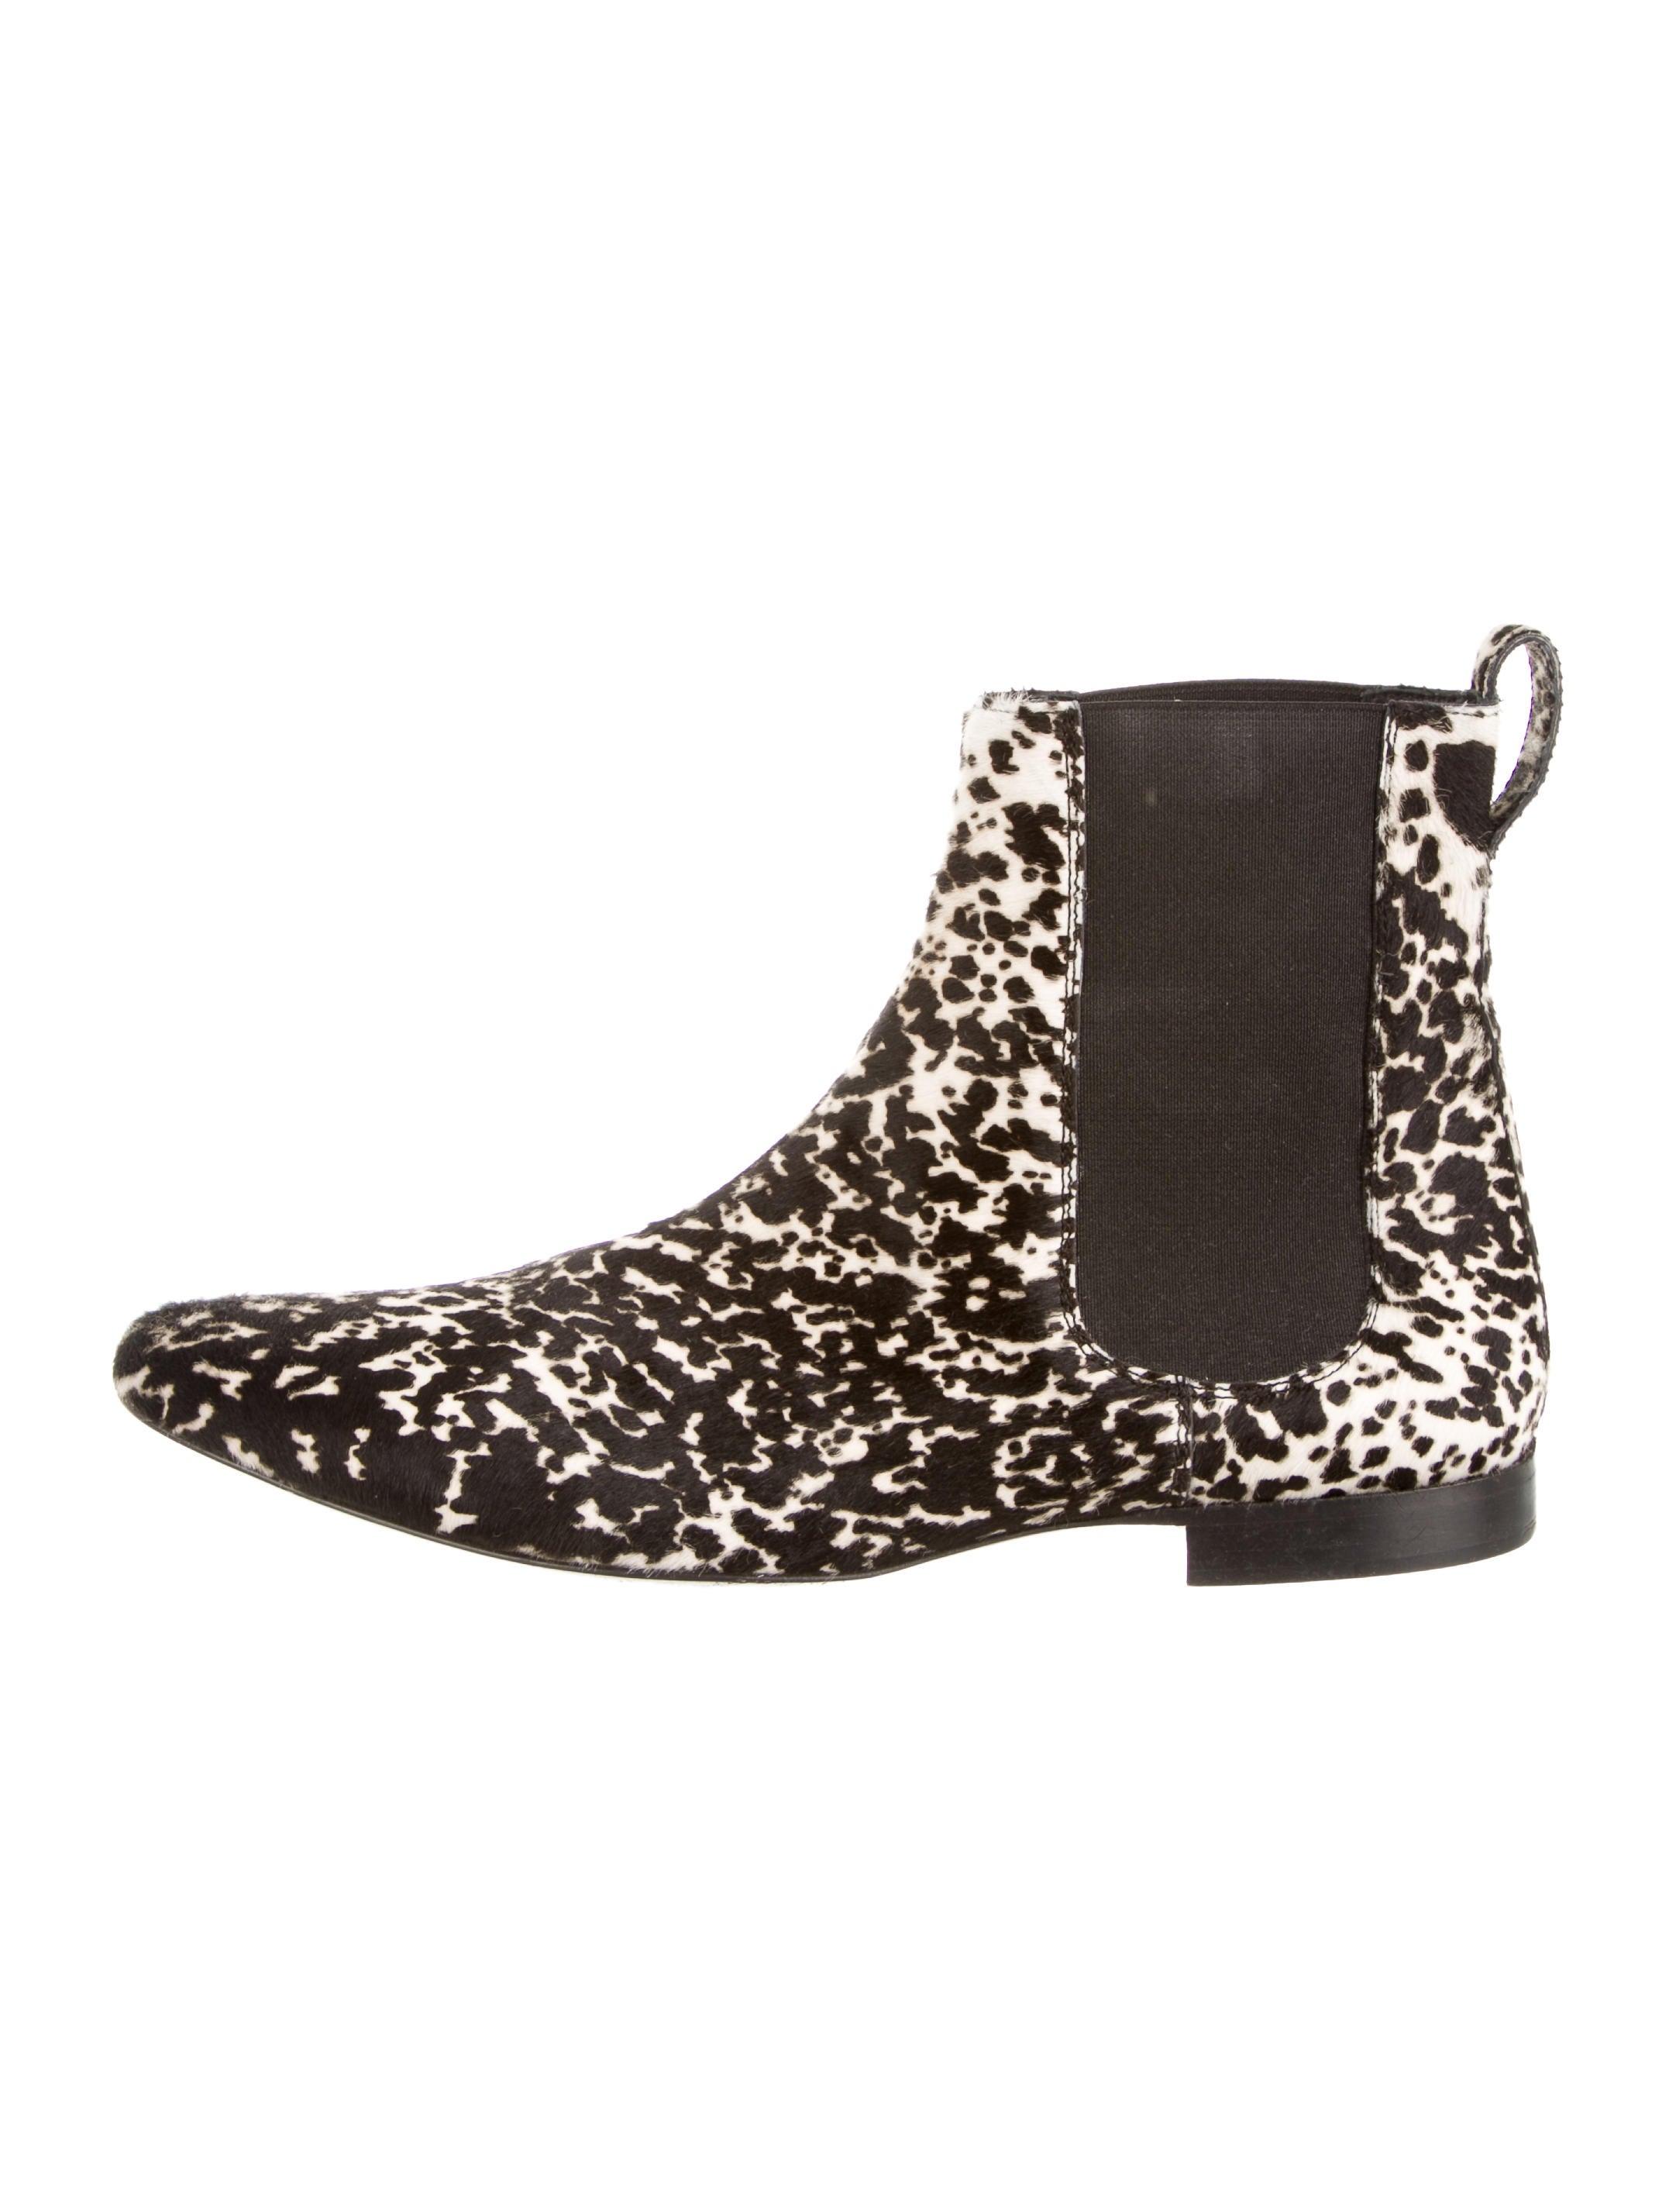 burberry prorsum ponyhair chelsea boots shoes buf21093